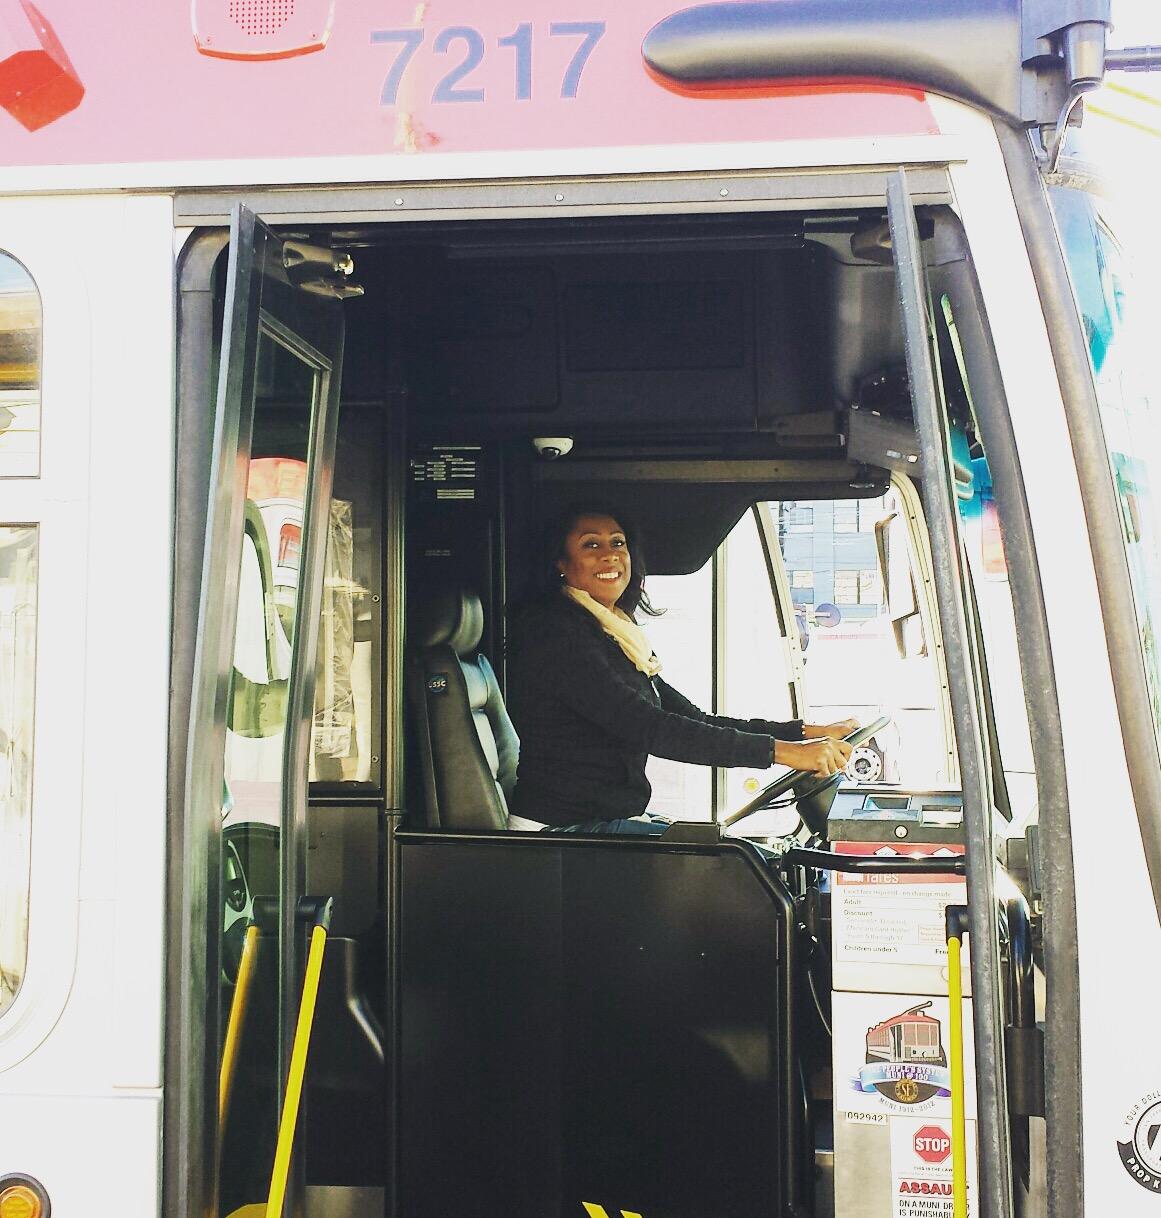 Jessica the Bus Driver!